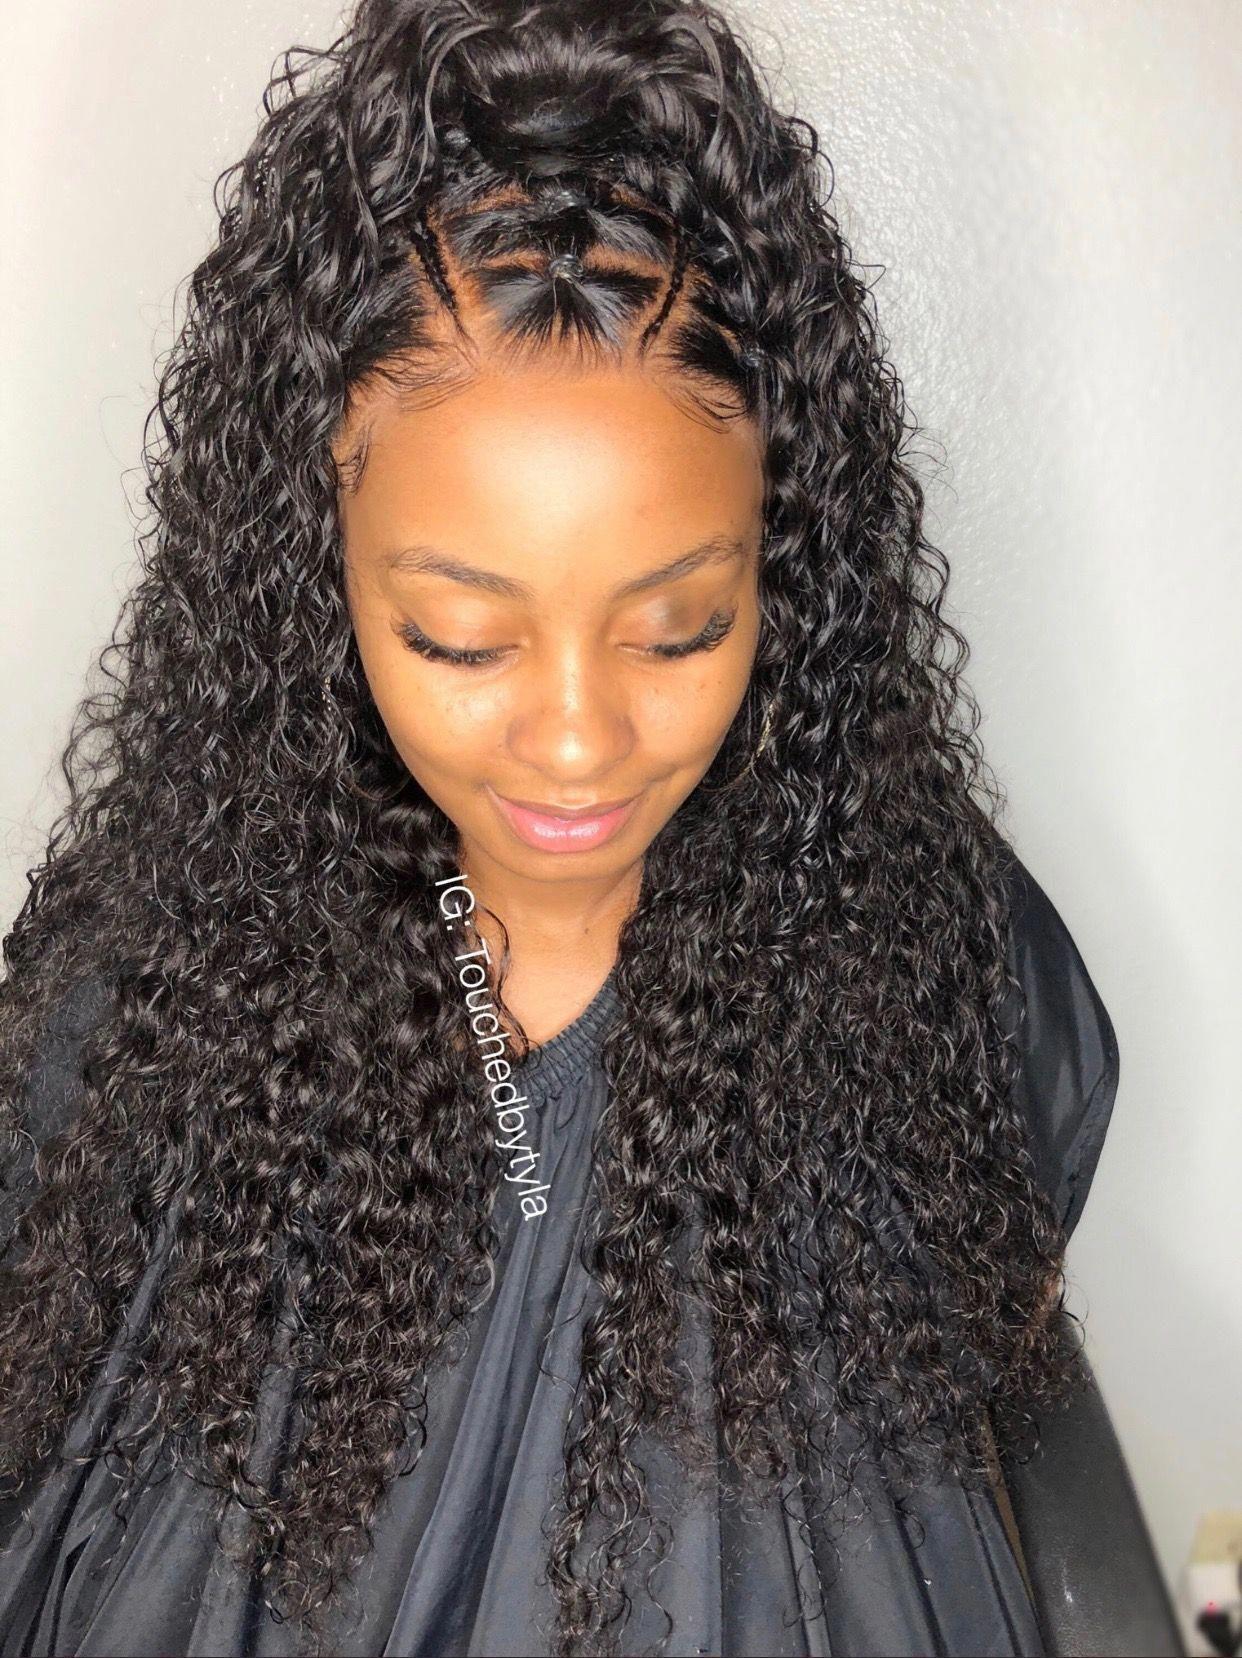 Adore this blackhairstylesforlonghair black ponytail